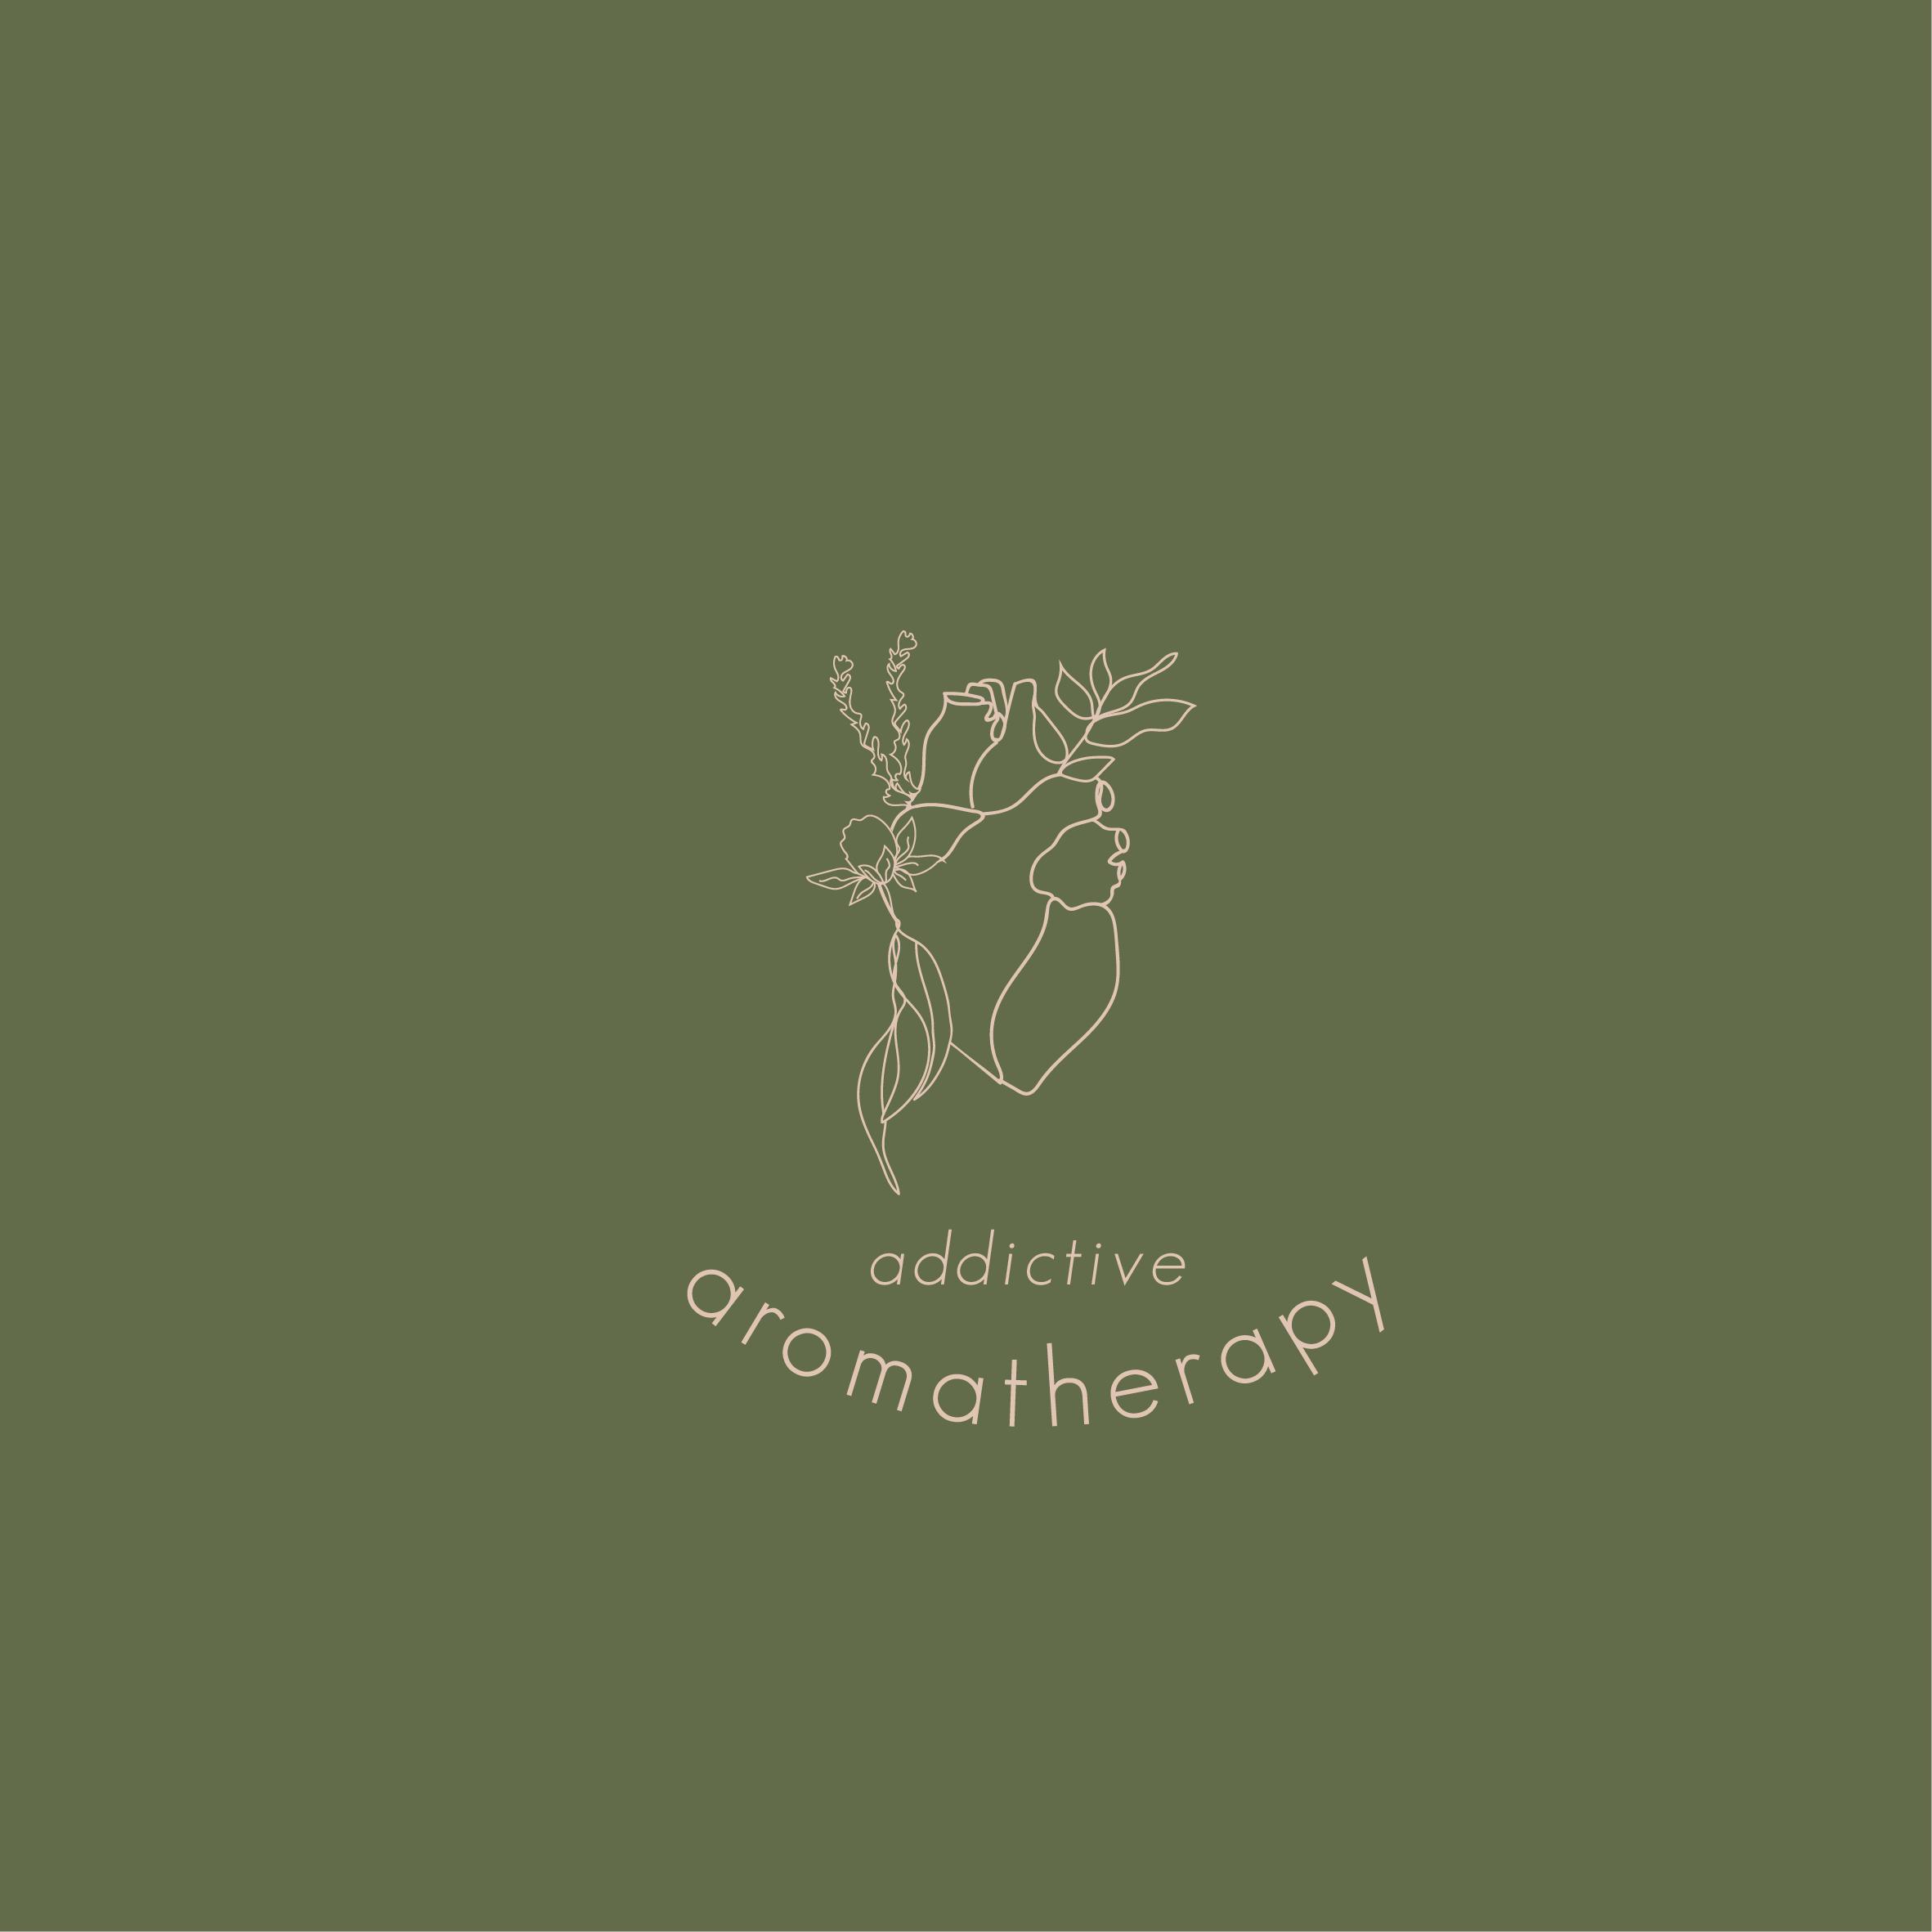 final logo-07.png